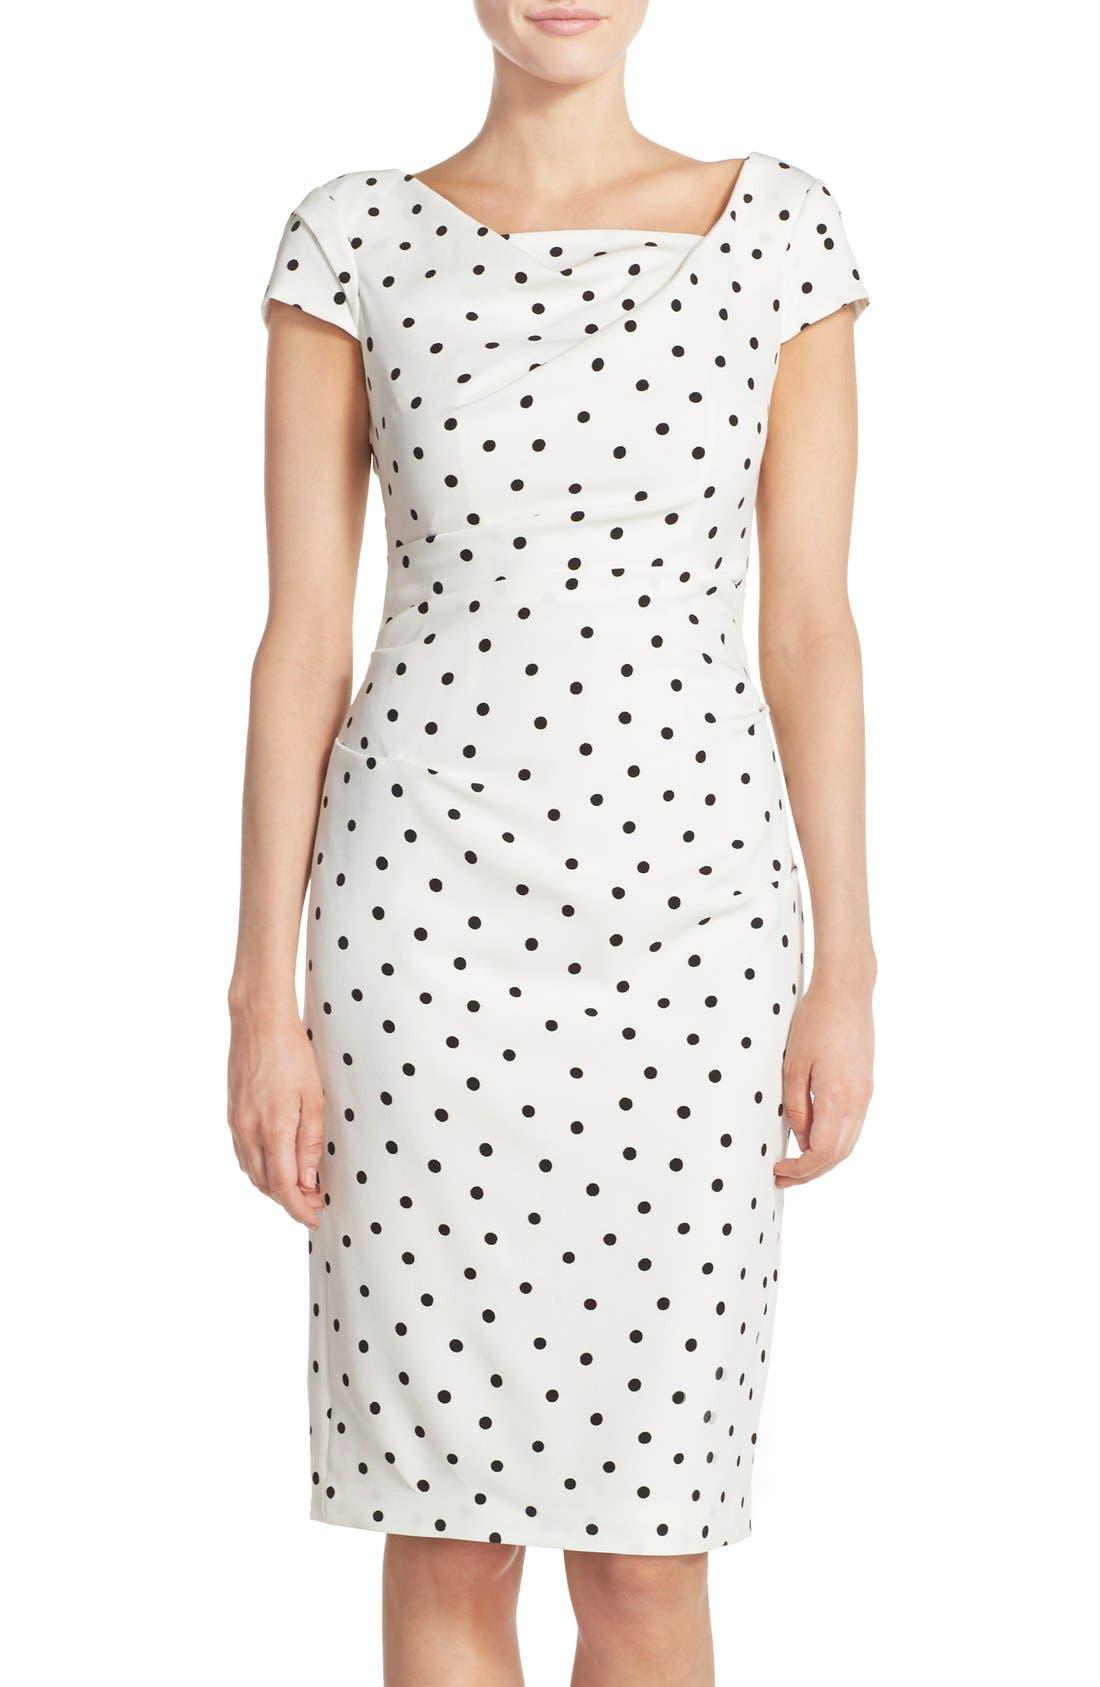 ADRIANNA PAPELL Polka Dot Crepe Sheath Dress, Main, color, 900